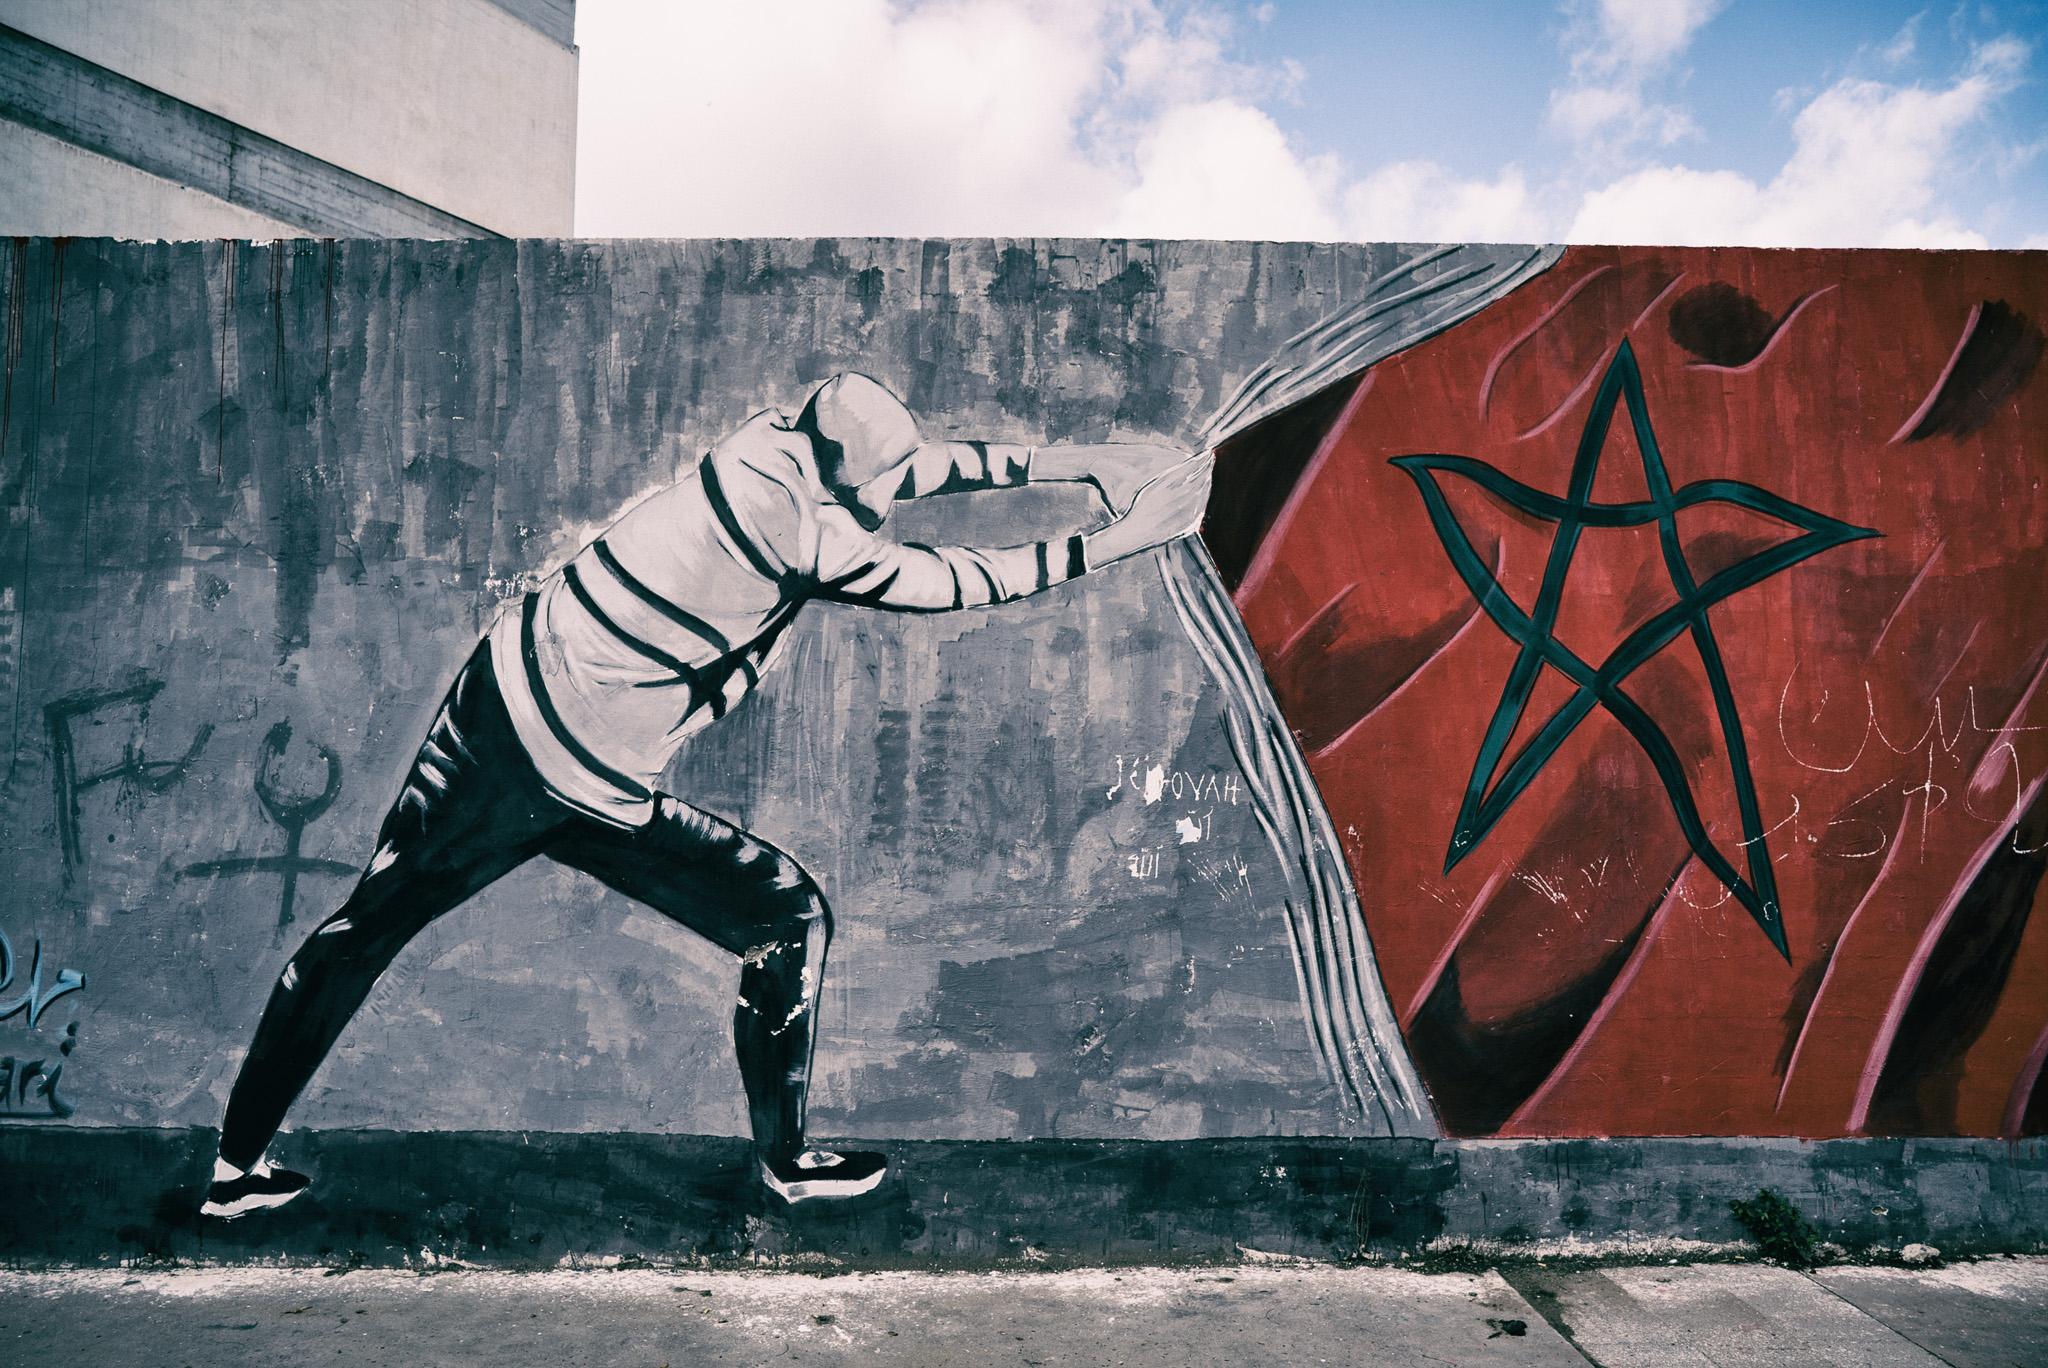 Moroccan flag street art in Casablanca. f./4.0, shutter 1/640th, ISO 100.